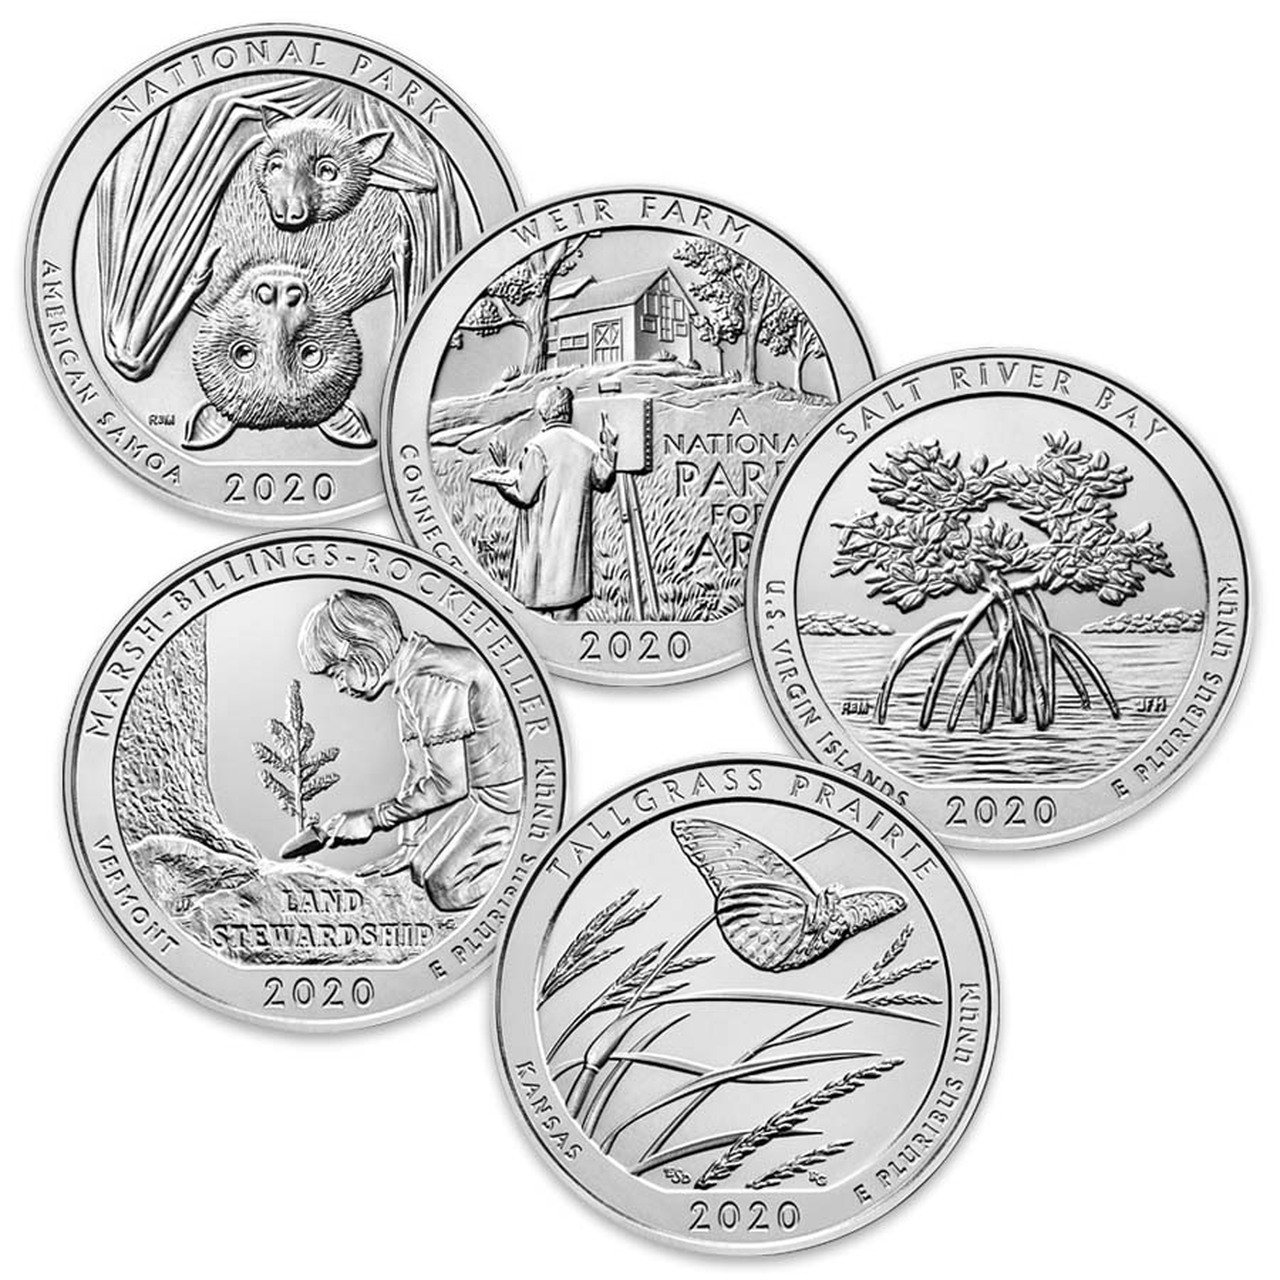 2020 National Park Quarters 5 Coins Brilliant Uncirculated